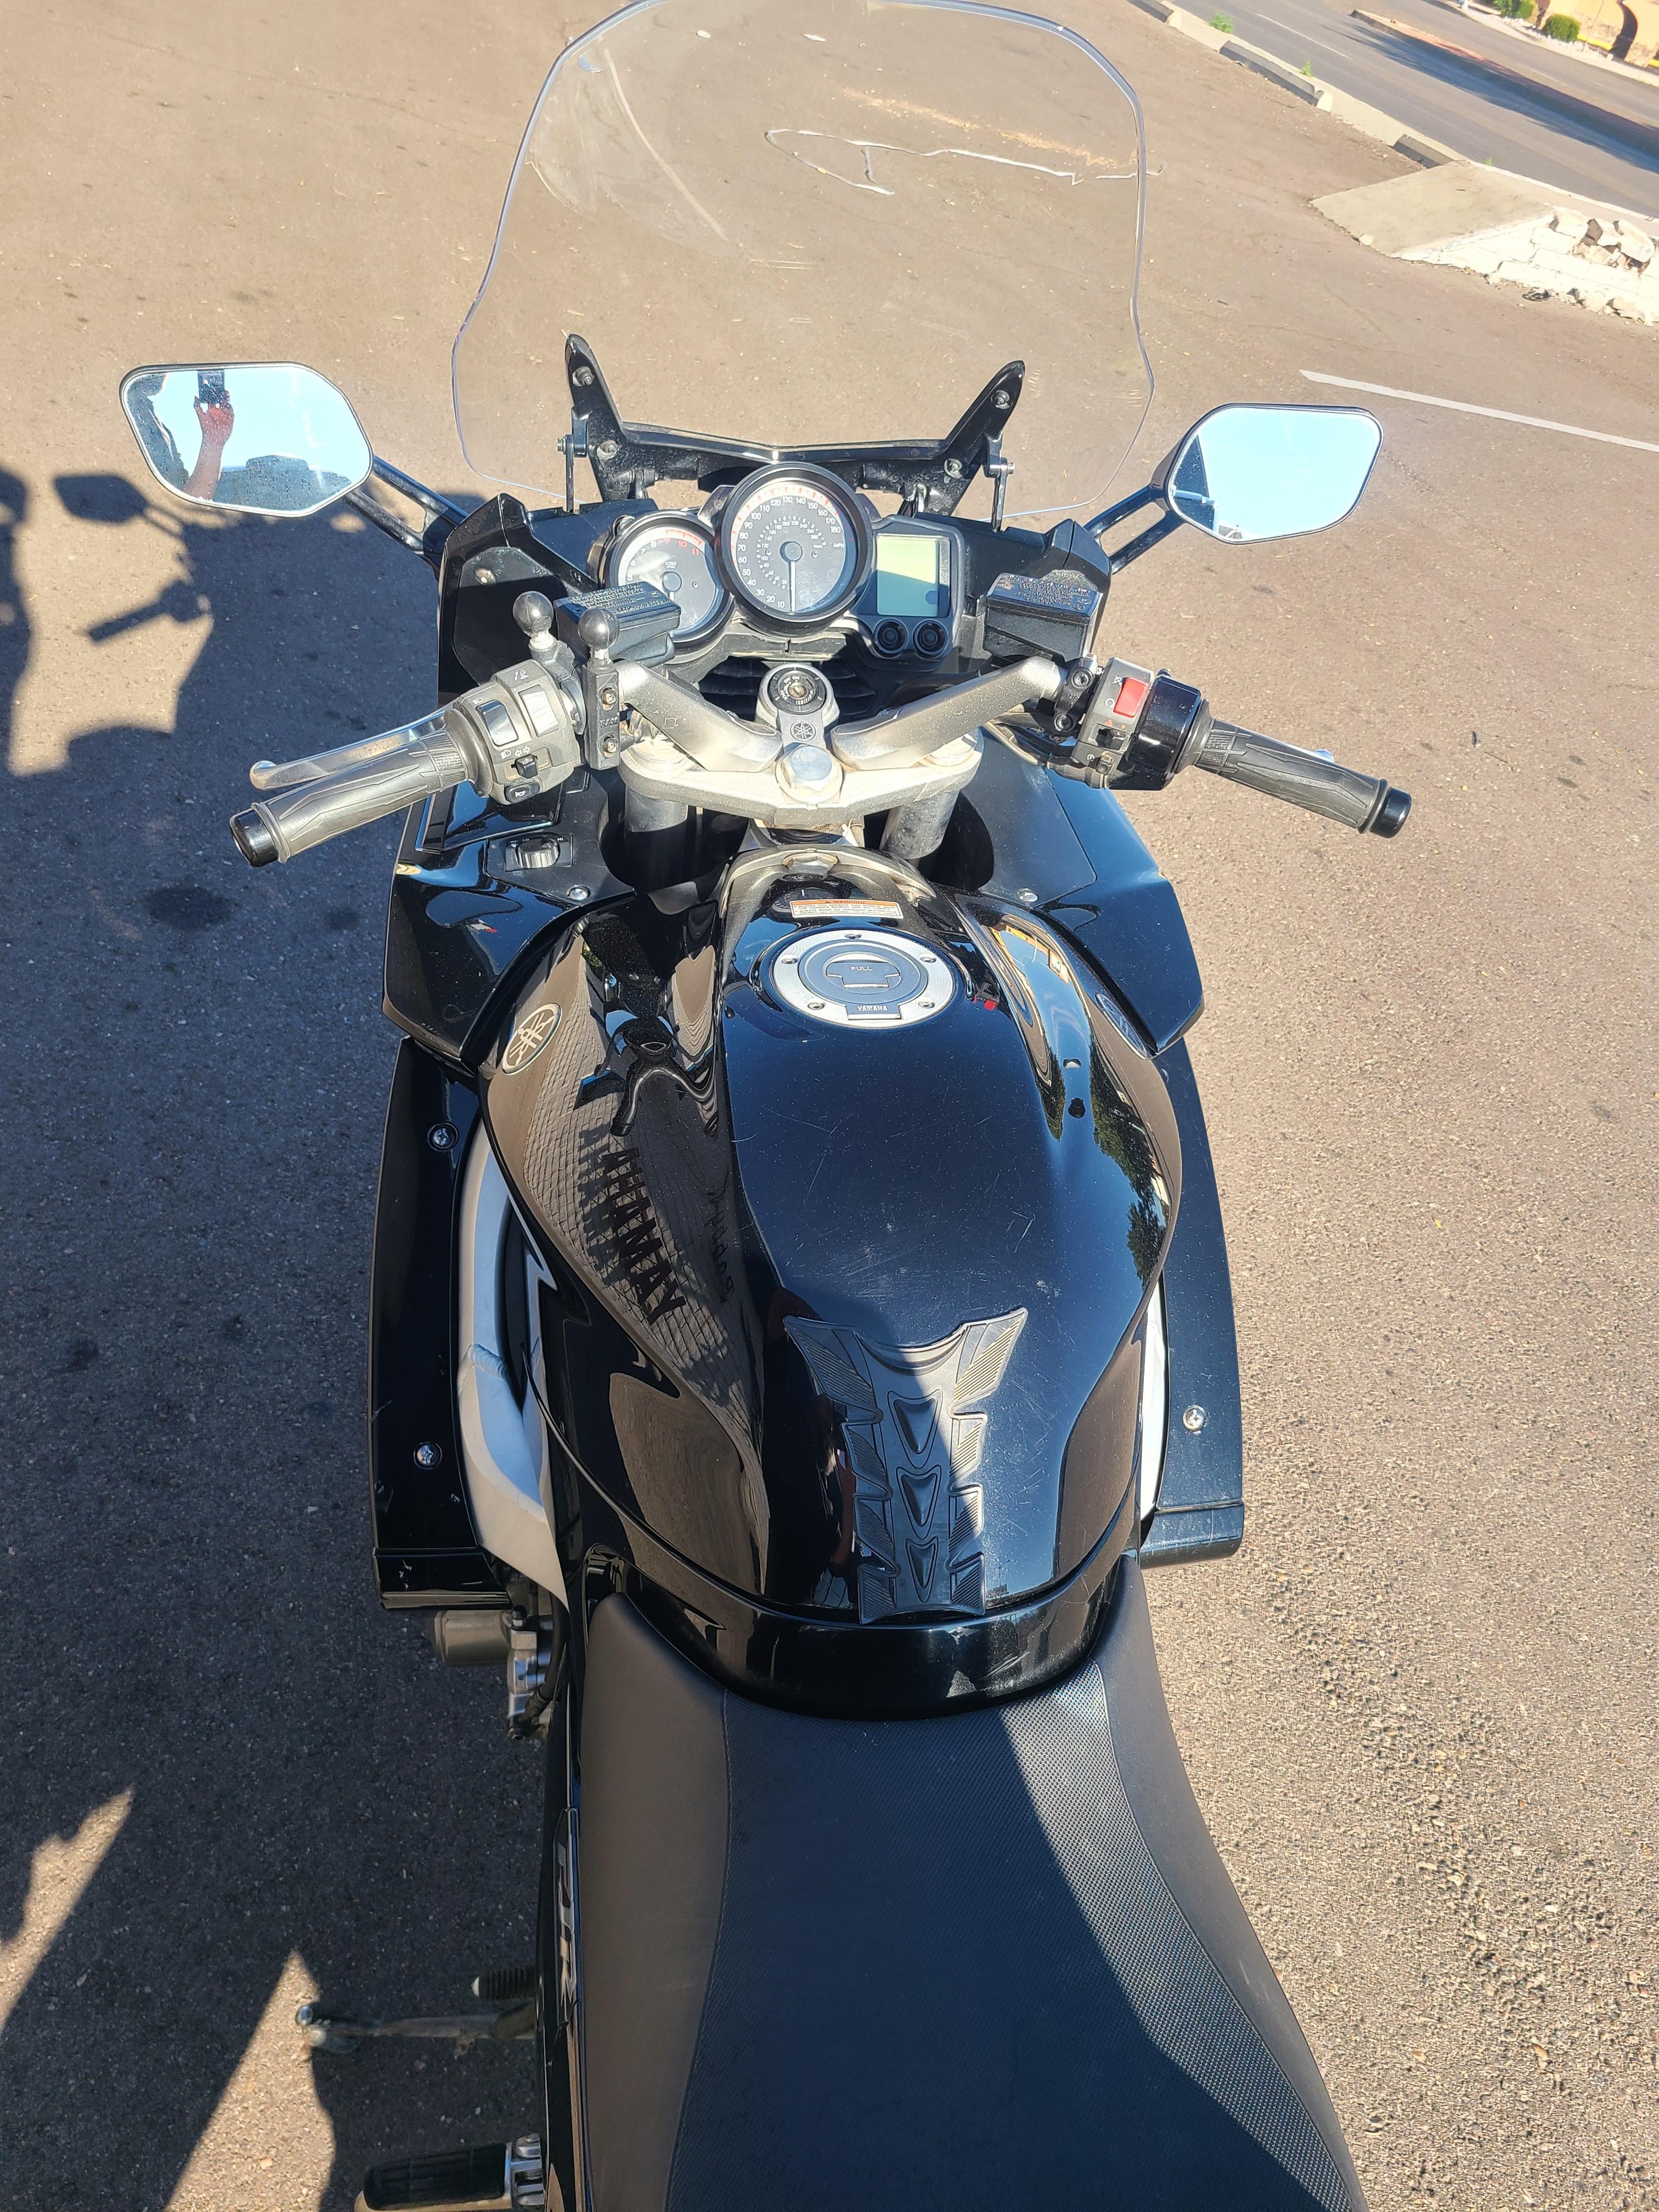 2009 Yamaha FJR 1300A at Bobby J's Yamaha, Albuquerque, NM 87110